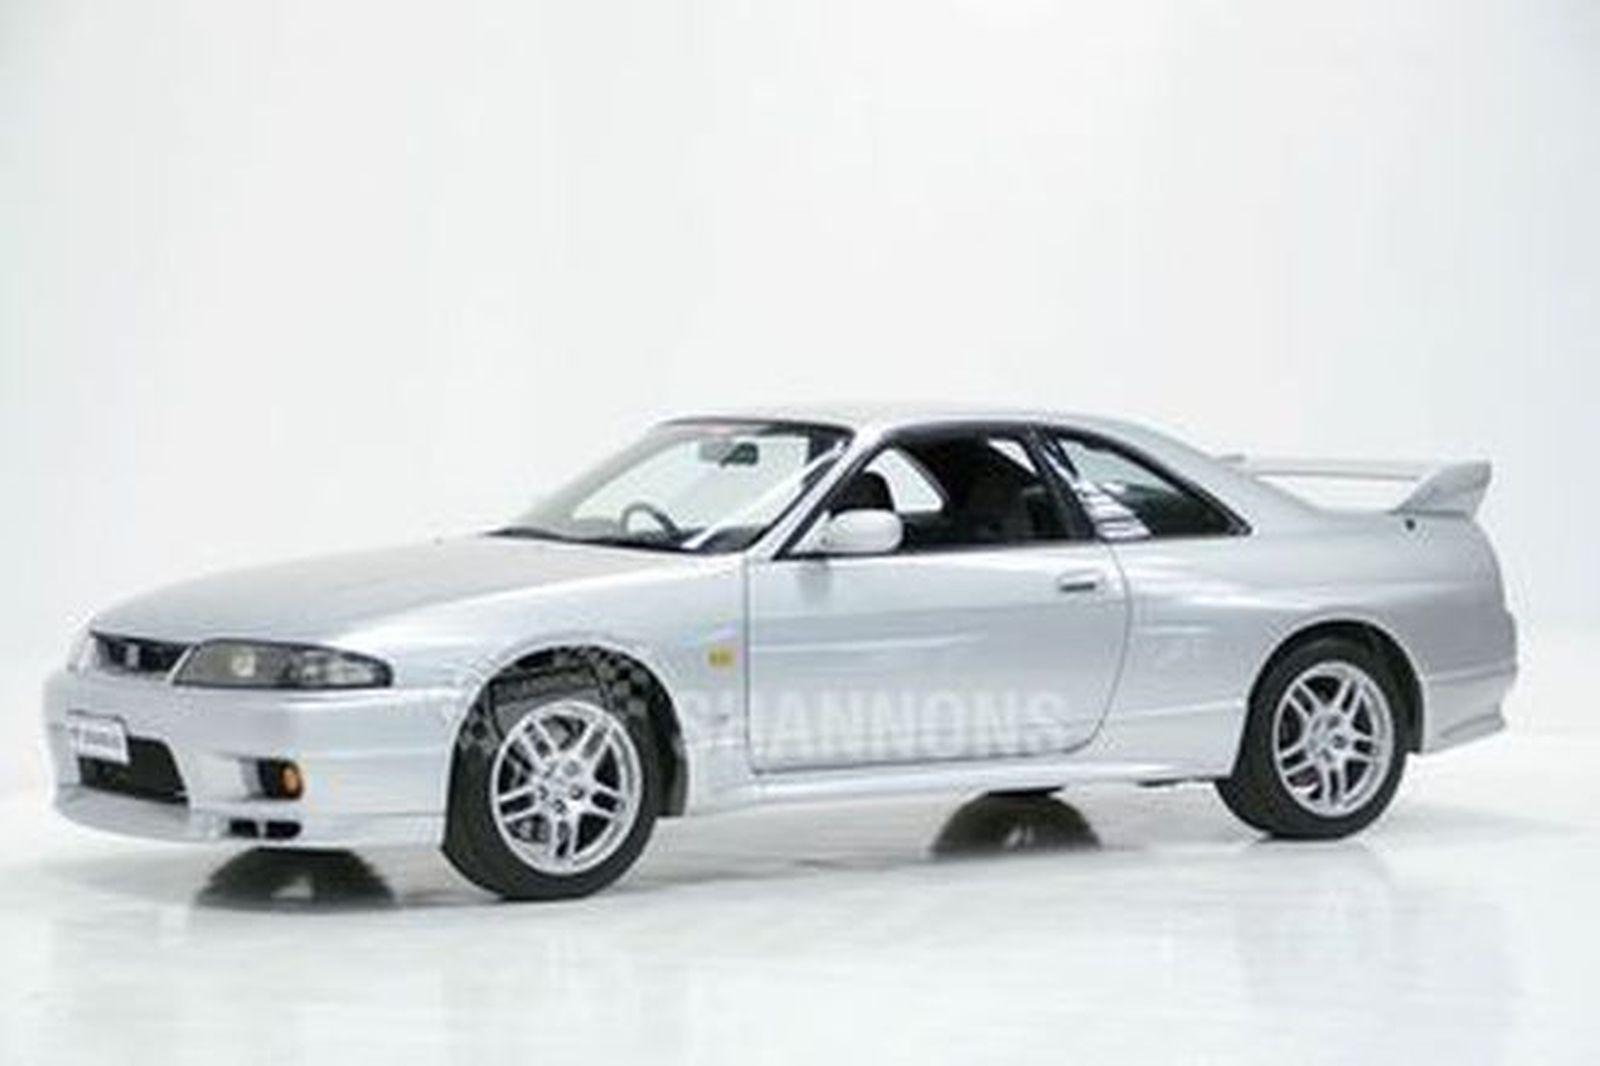 Sold: Nissan Skyline R33 GTR V-Spec Coupe Auctions - Lot ...